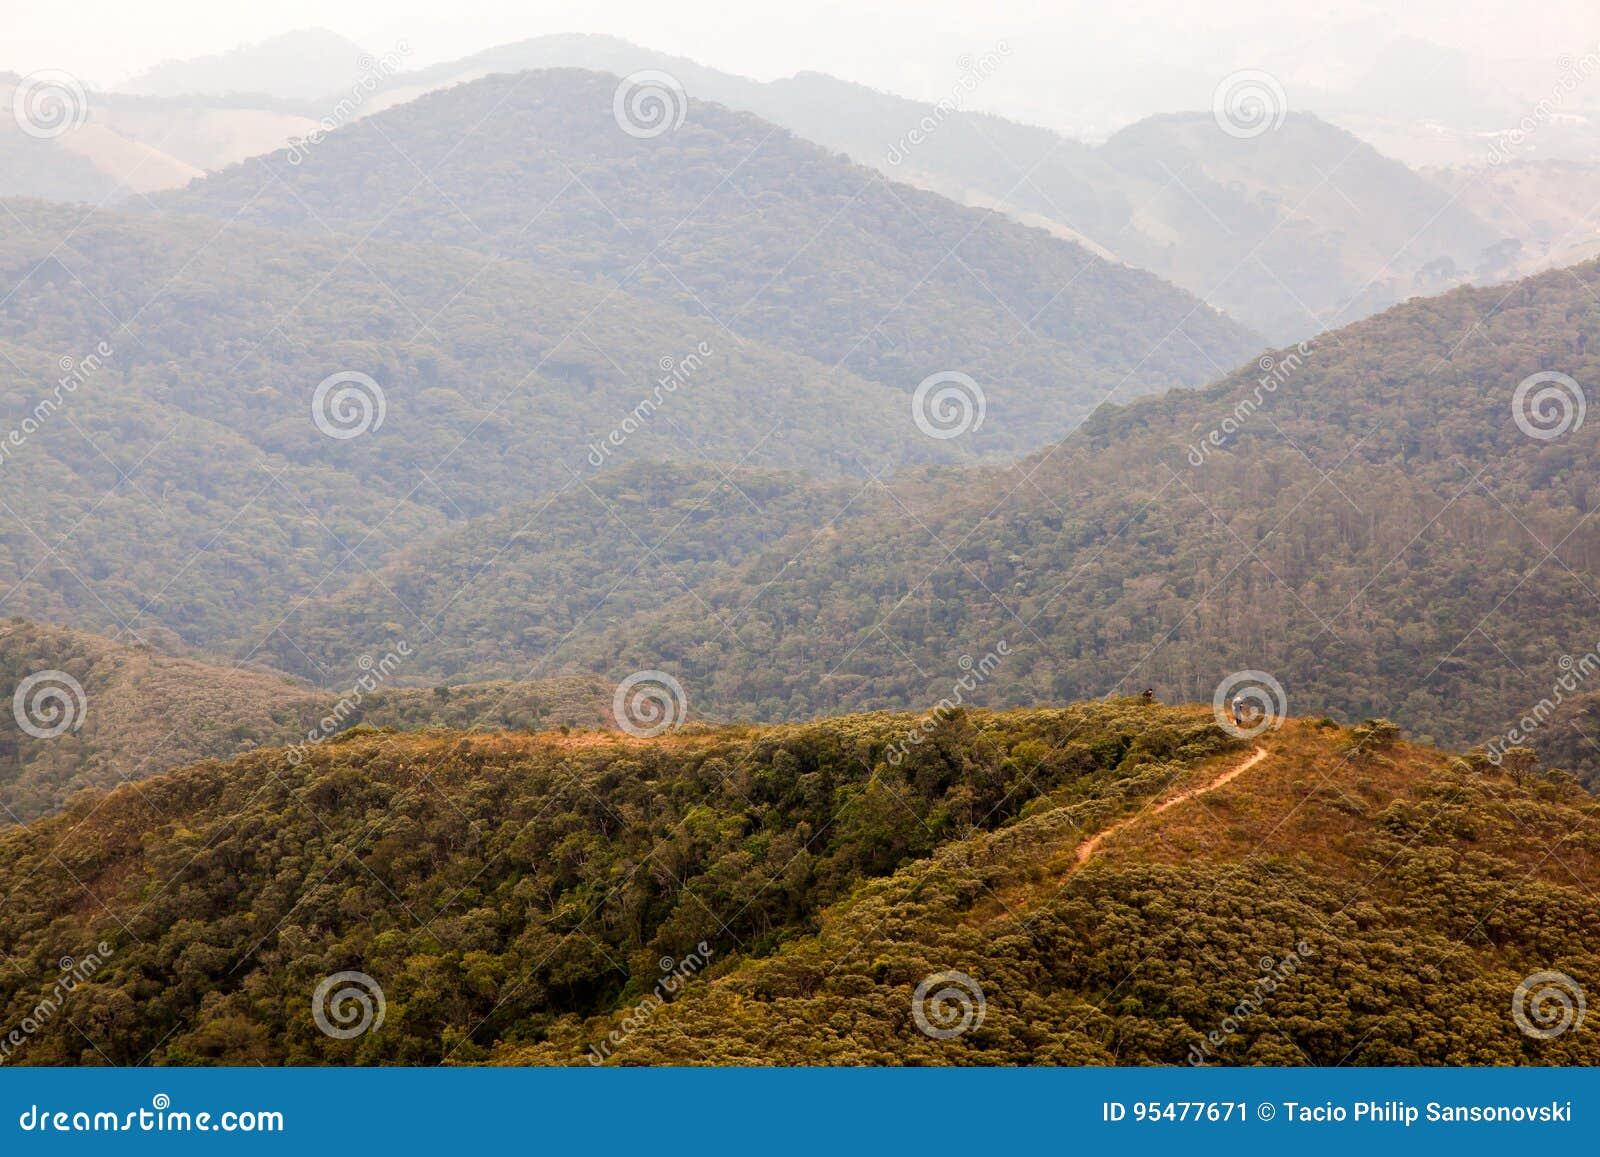 La gente su trekking in una montagna nel Brasile del sud